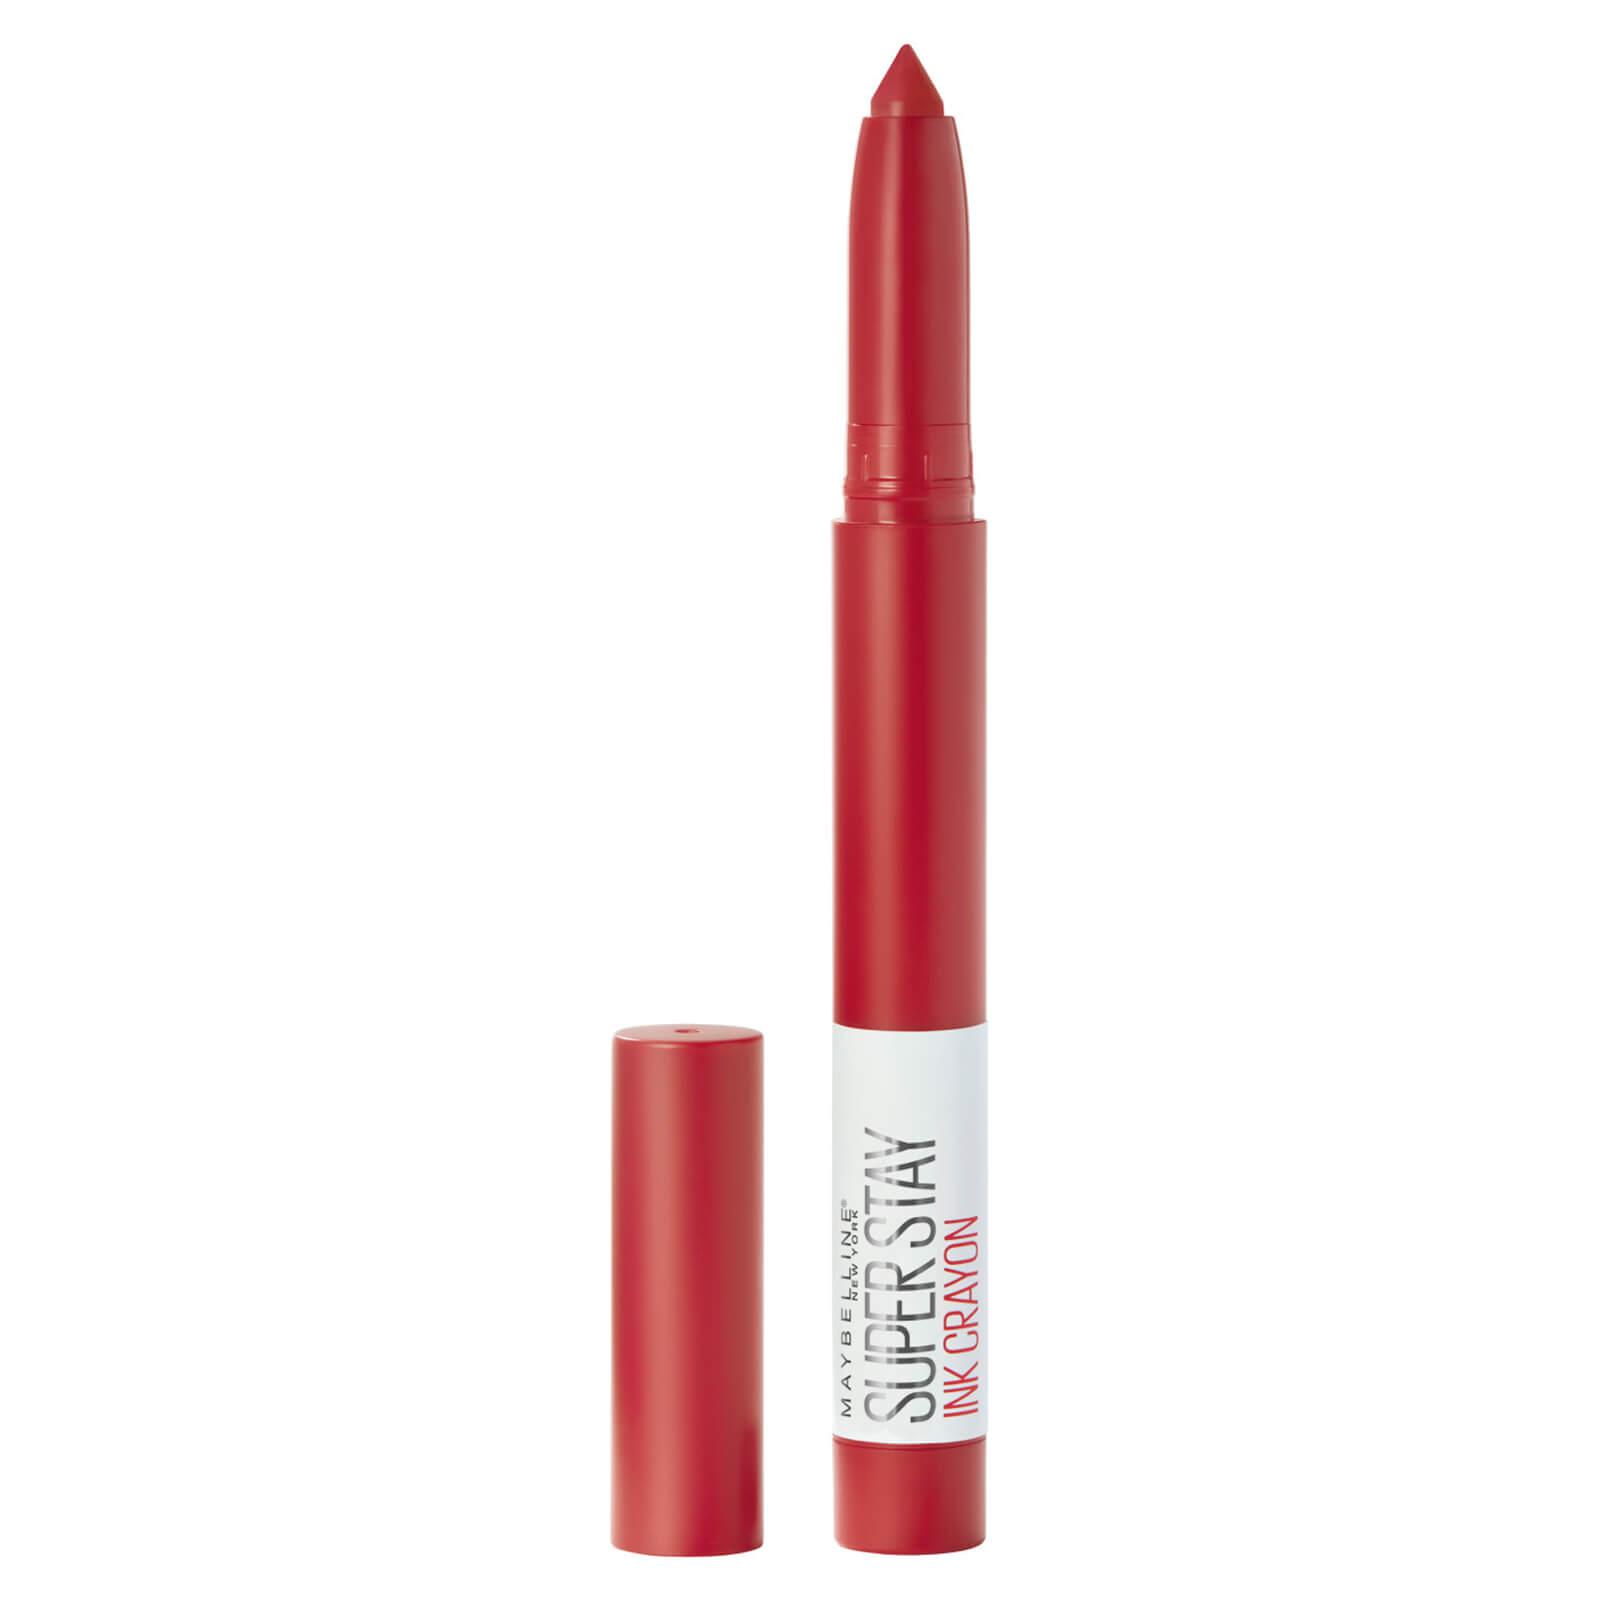 Купить Maybelline Superstay Matte Ink Crayon Lipstick 32g (Various Shades) - 45 Hustle in Heels